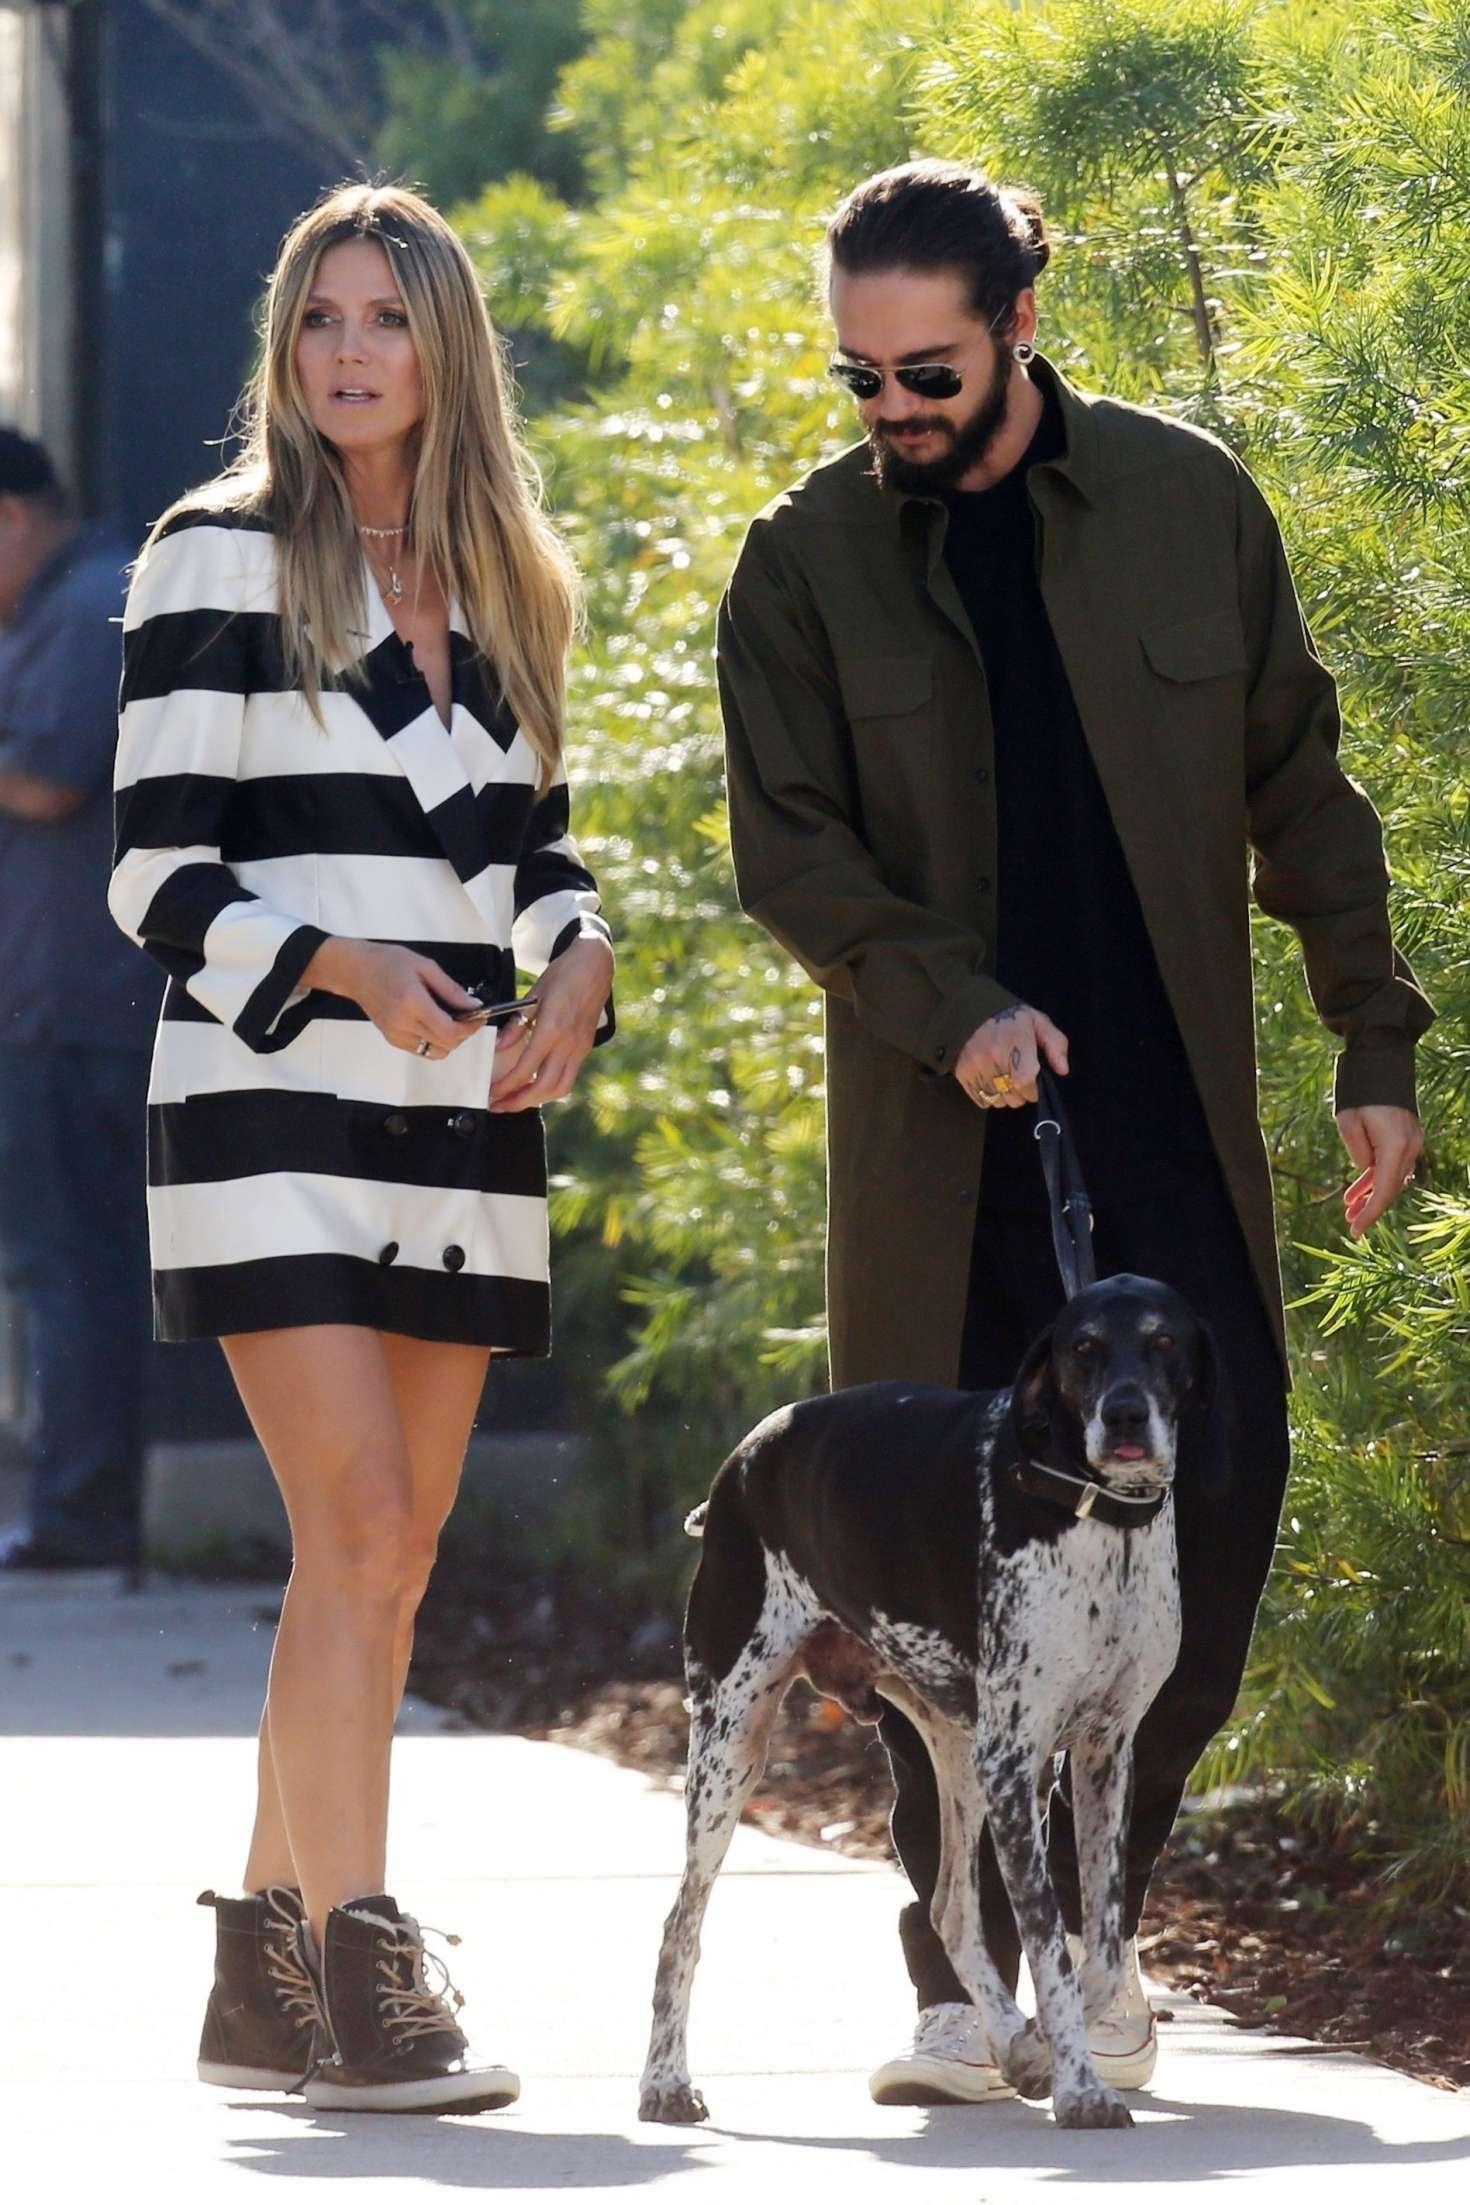 Heidi Klum and her boyfriend Tom Kaulitz - Walk with his dog in Los Angeles